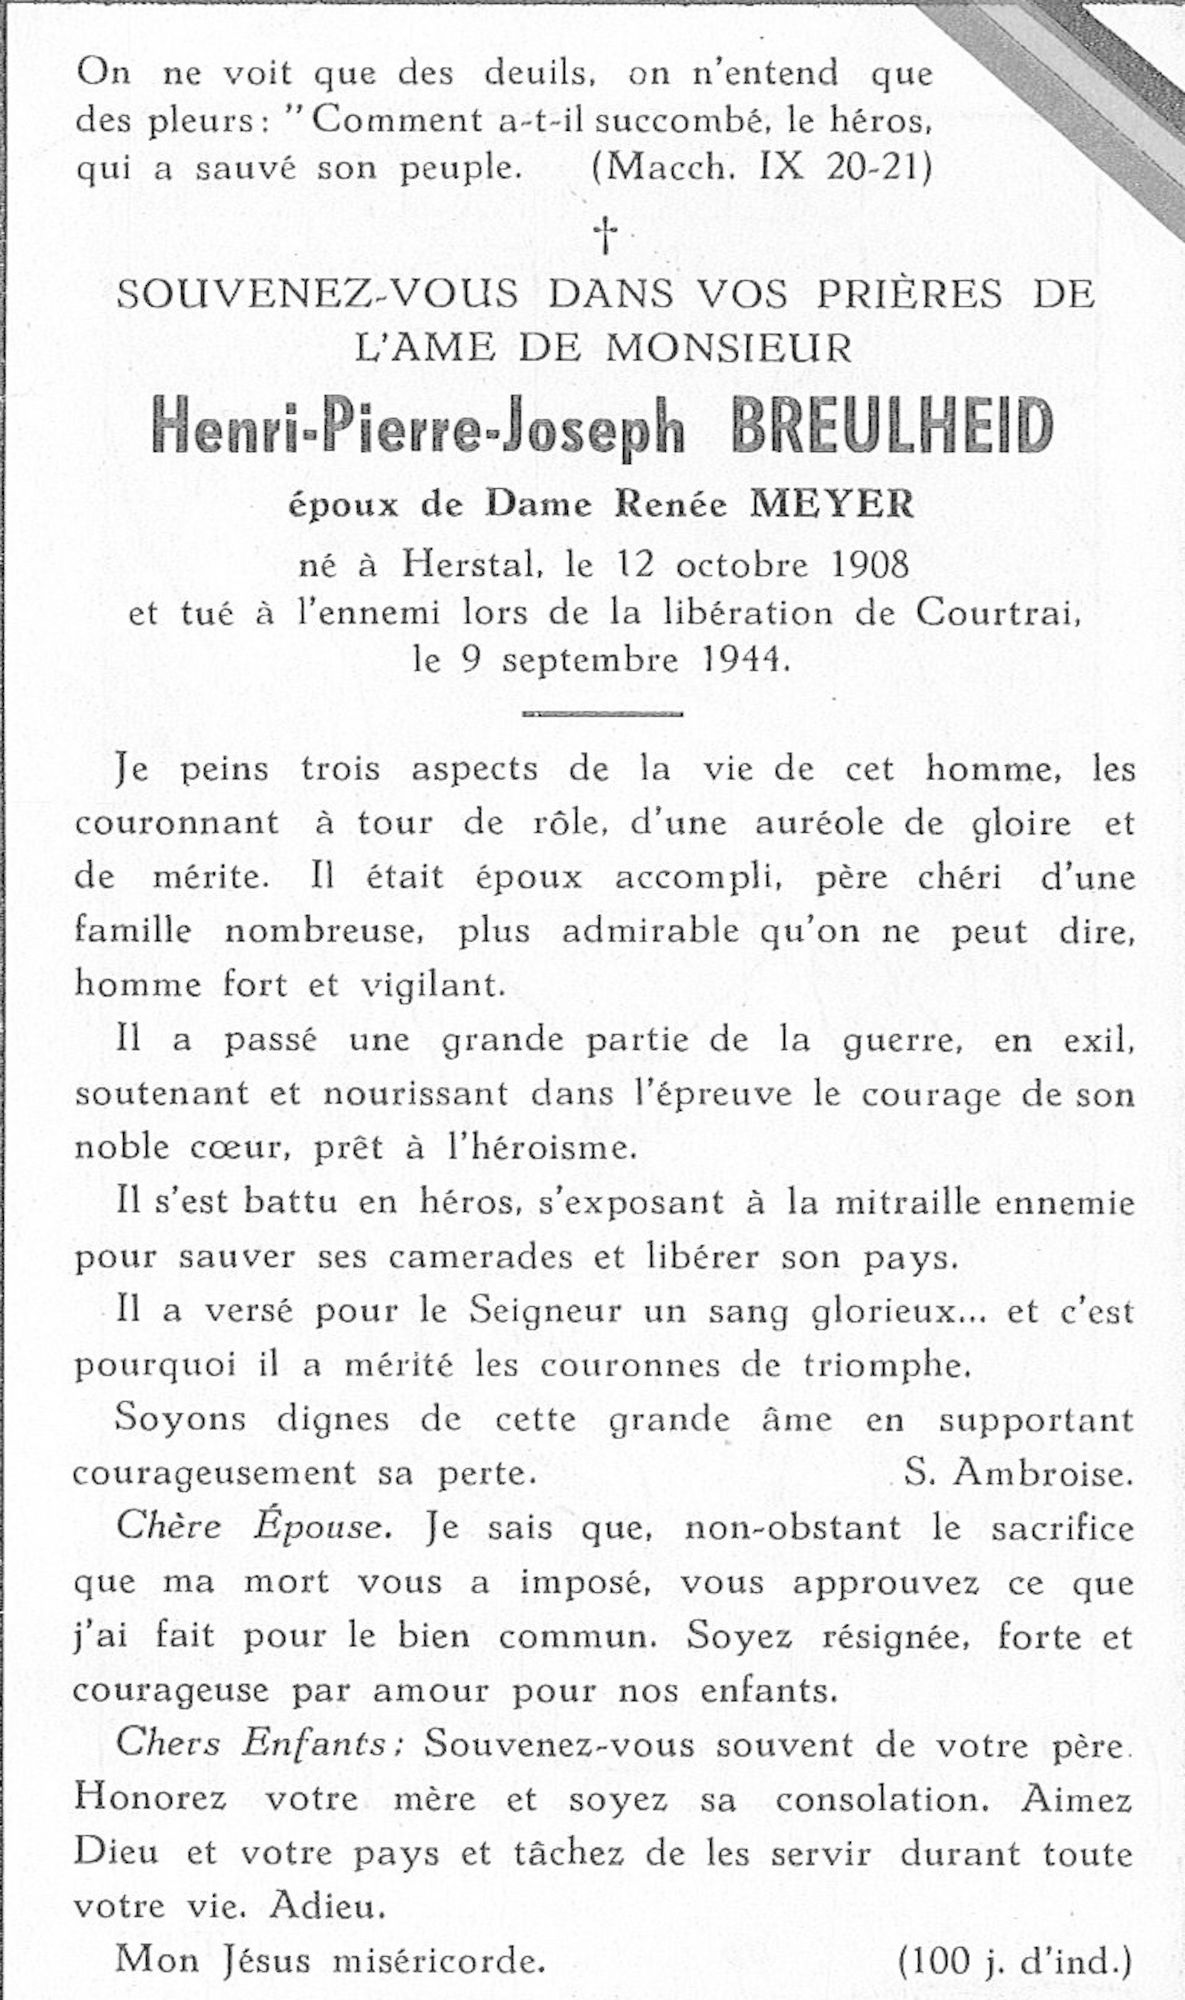 Henri-Pierre-Joseph Breulheid